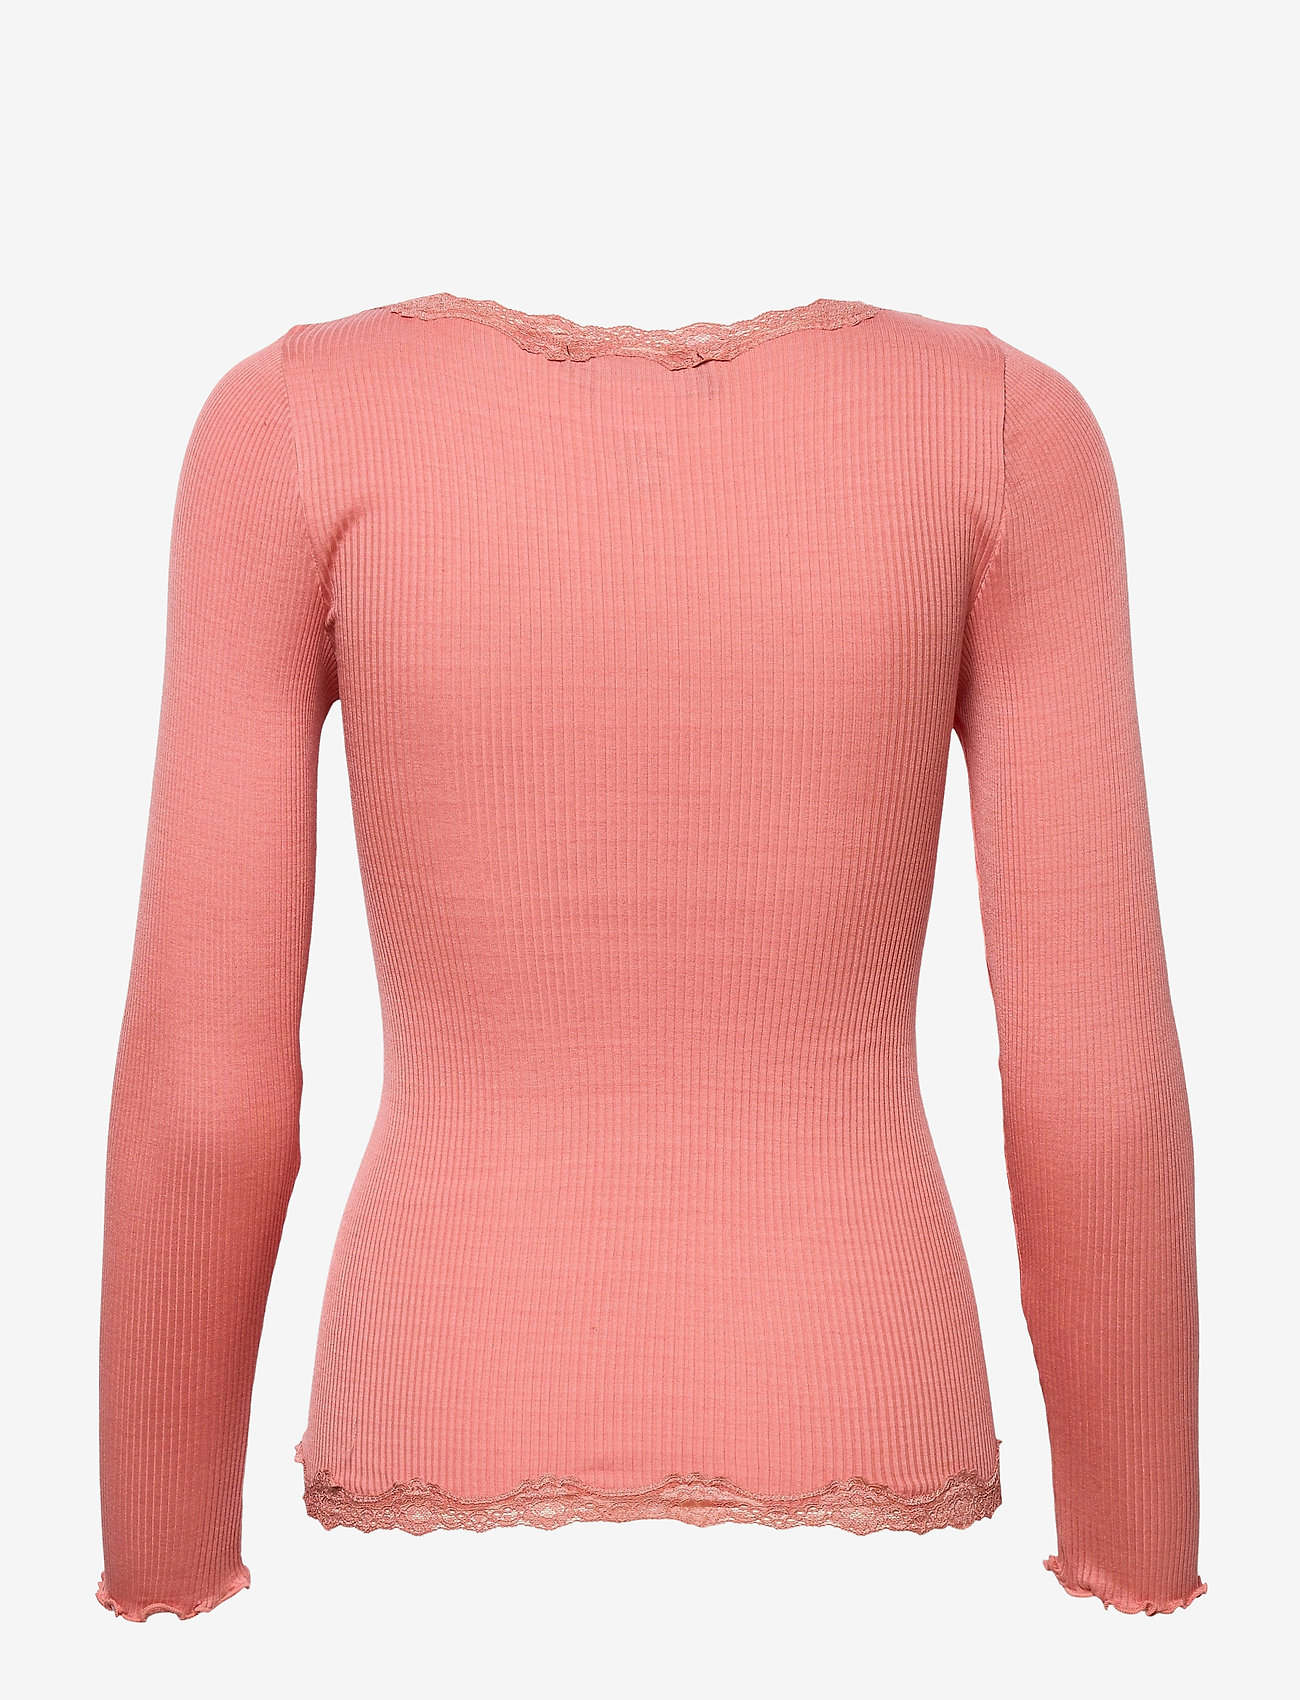 Rosemunde - Silk cardigan w/ lace - neuletakit - dark peach - 1